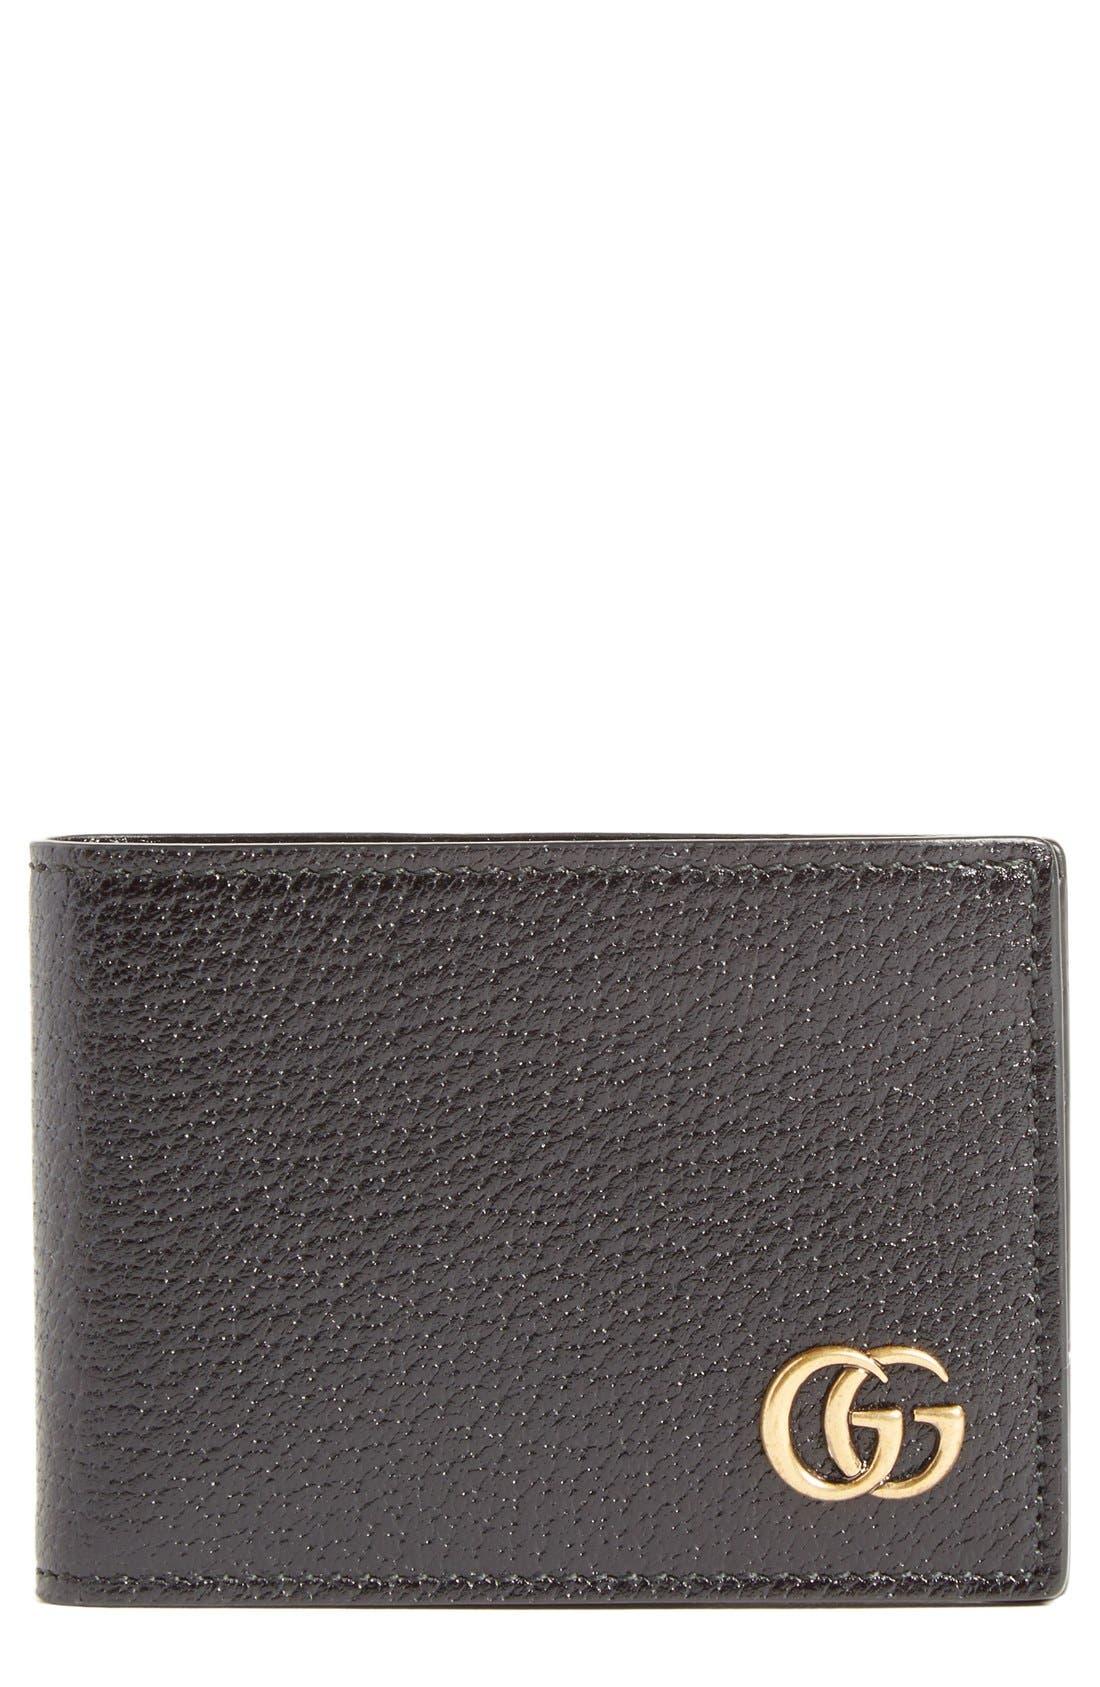 gucci keychain wallet. gucci keychain wallet u